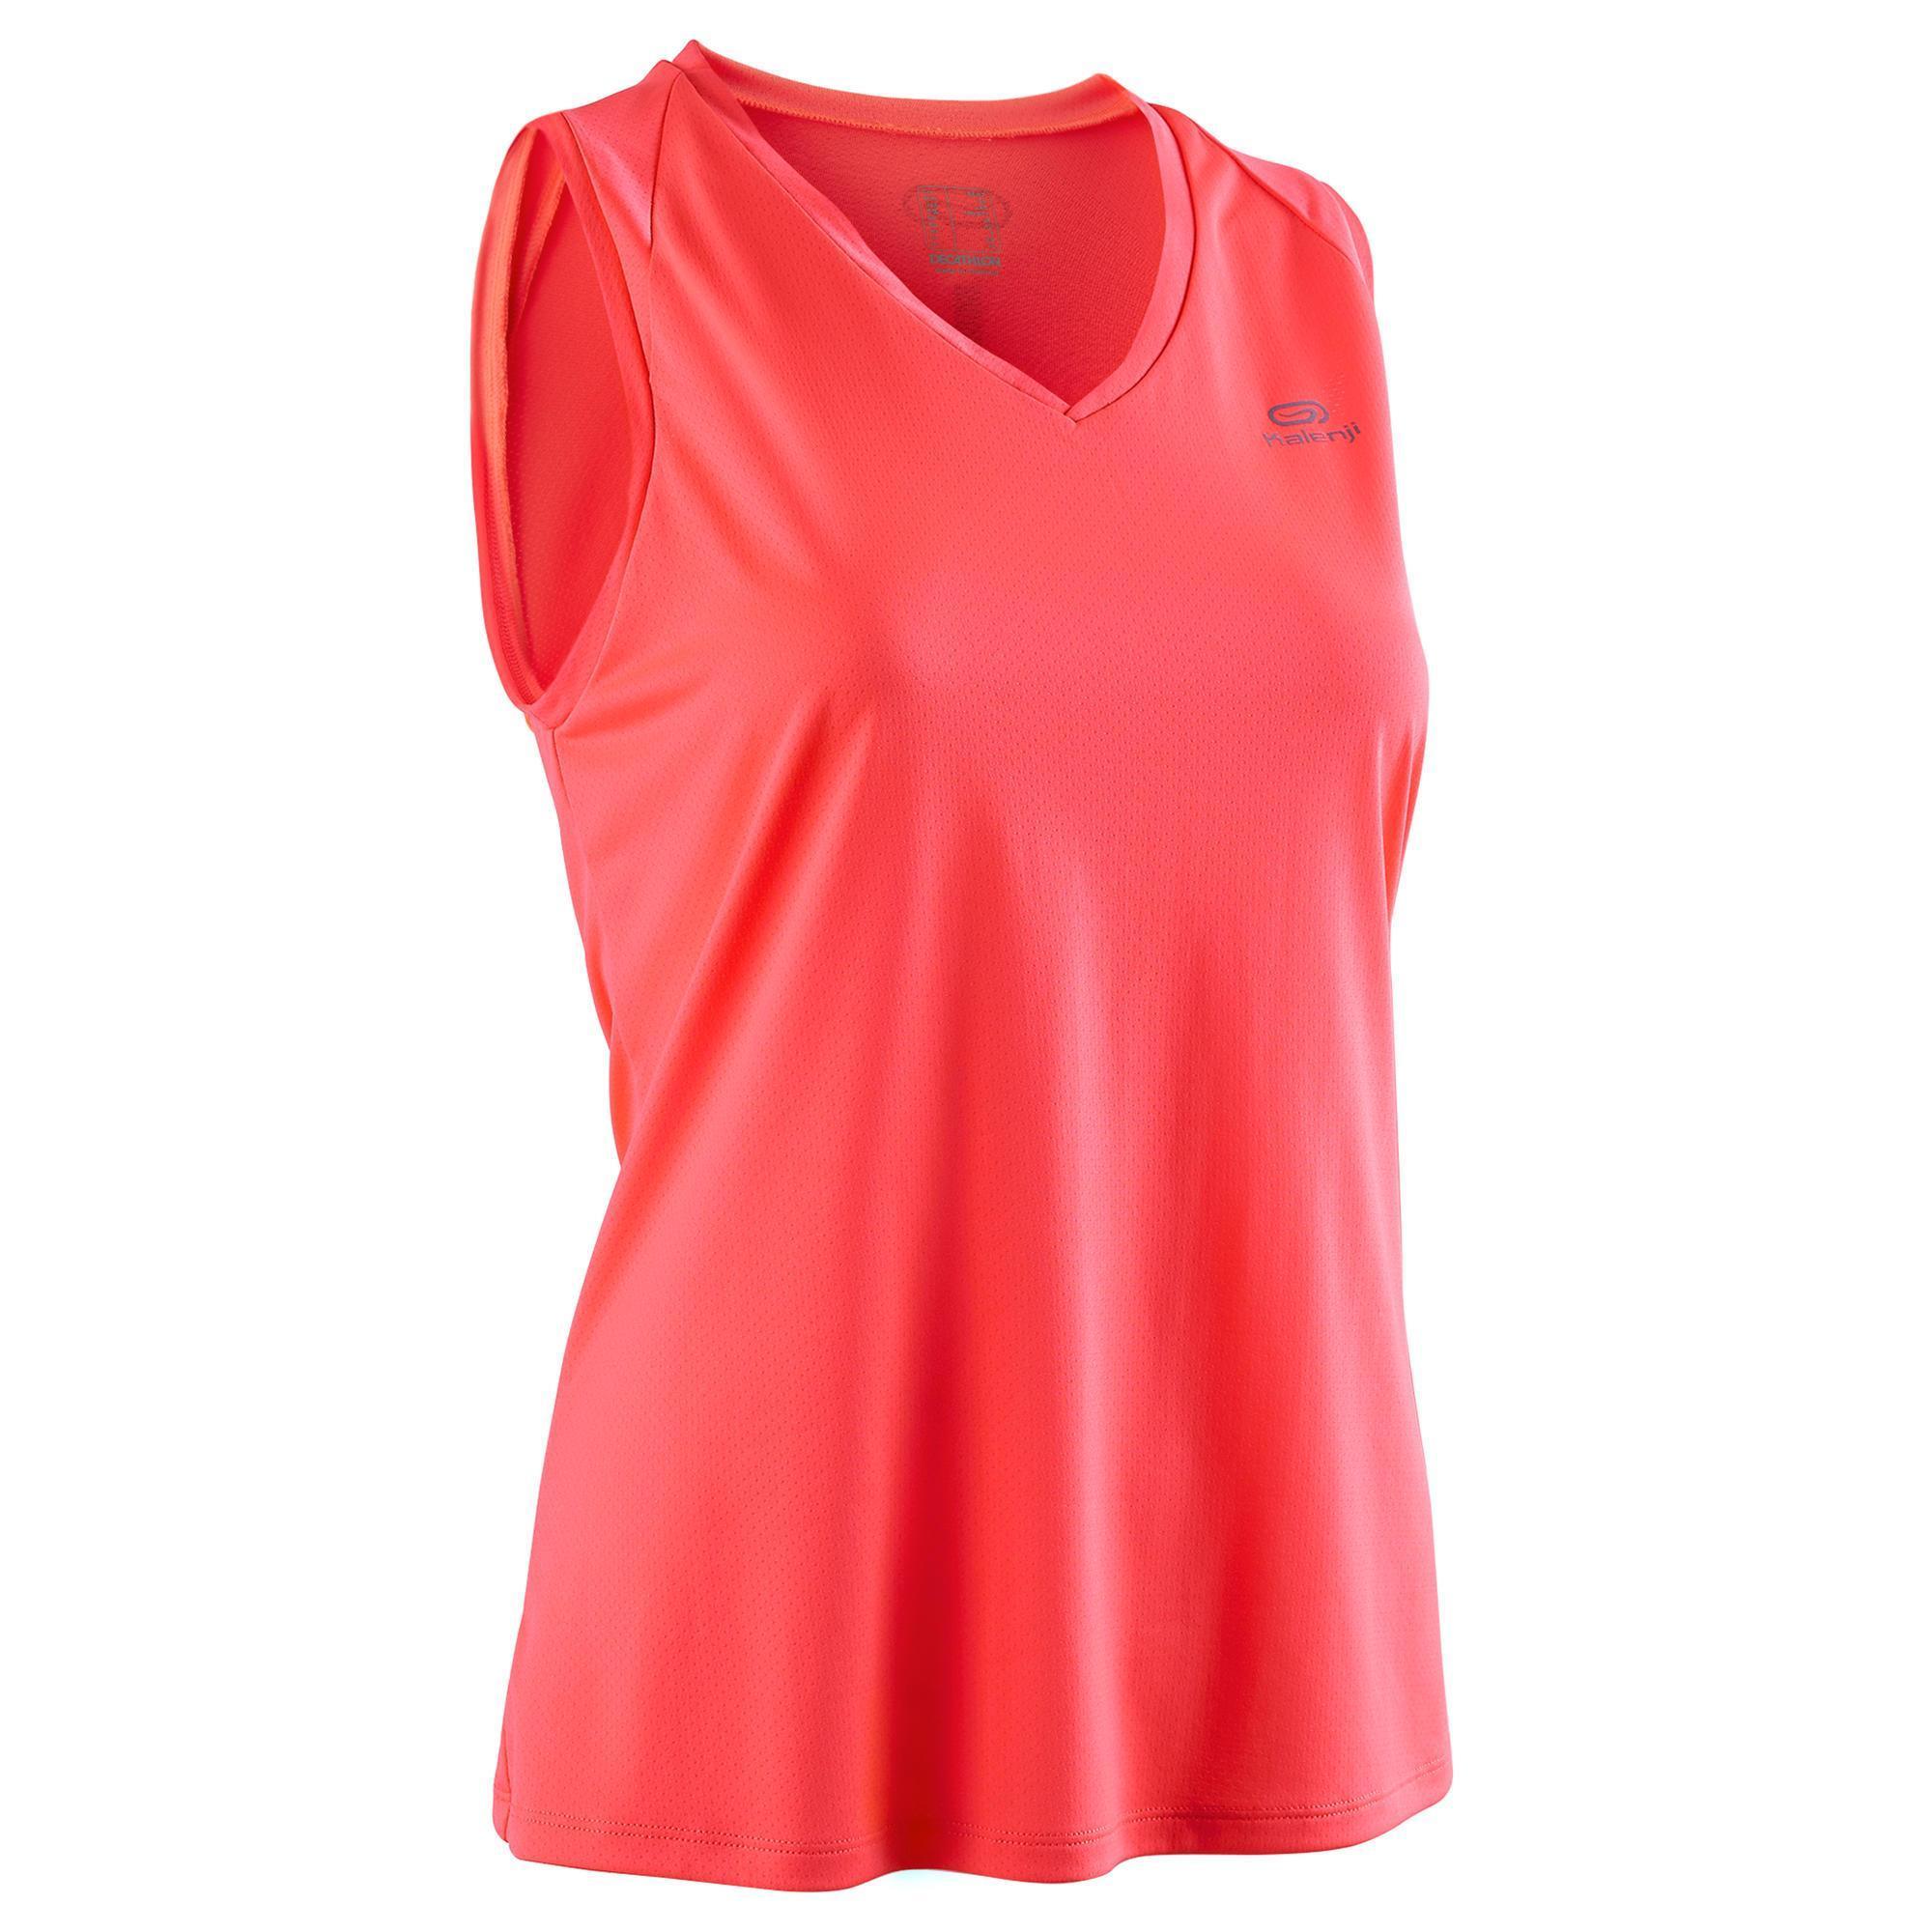 Lauftop Singlet Run Dry Damen koralle | Sportbekleidung > Sporttops > Lauftops | Rot - Rosa | Kalenji